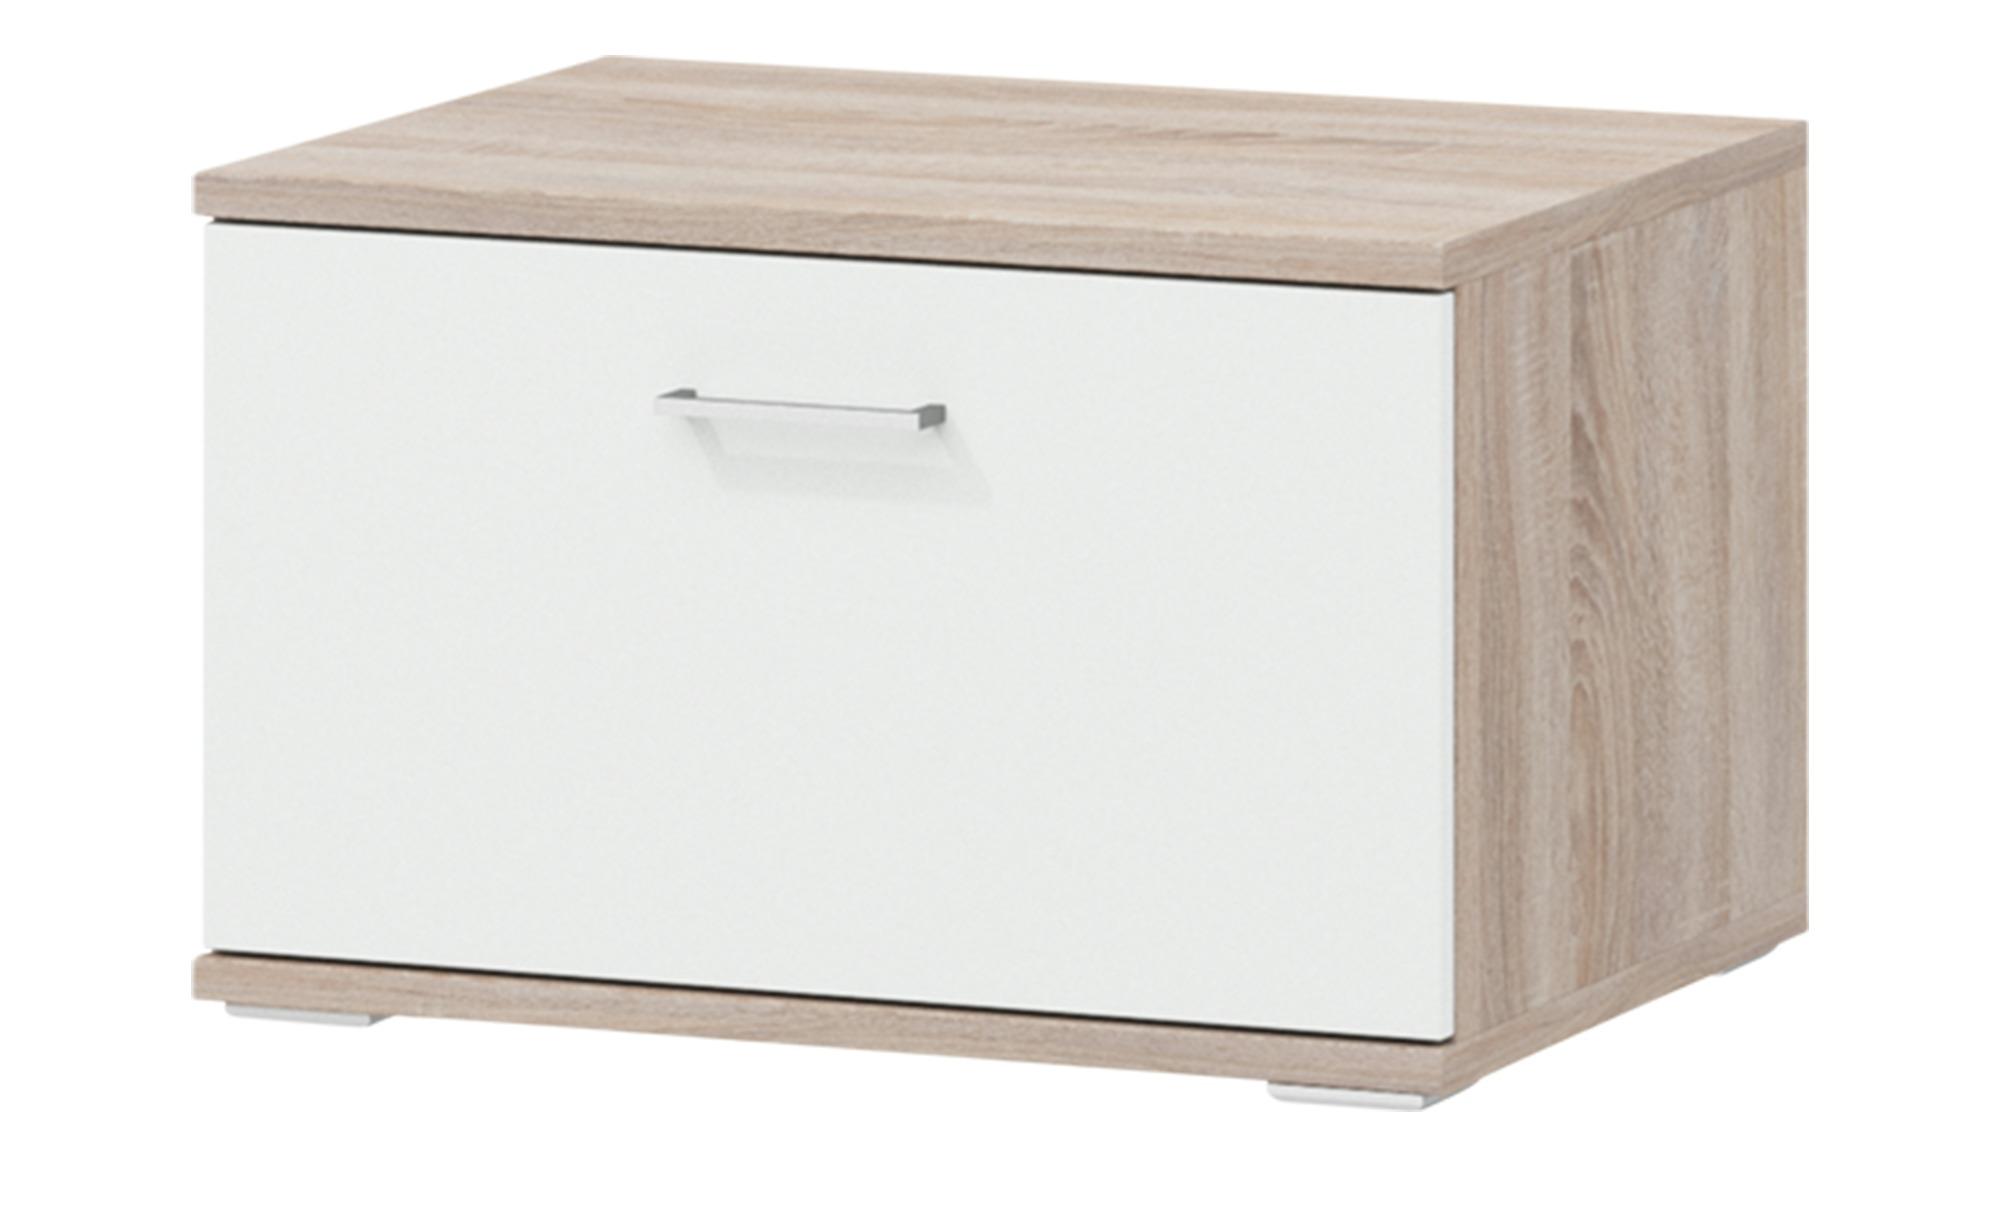 uno Lowboard  Onyx ¦ Maße (cm): B: 66 H: 42 T: 49 Kommoden & Sideboards > Lowboards - Höffner